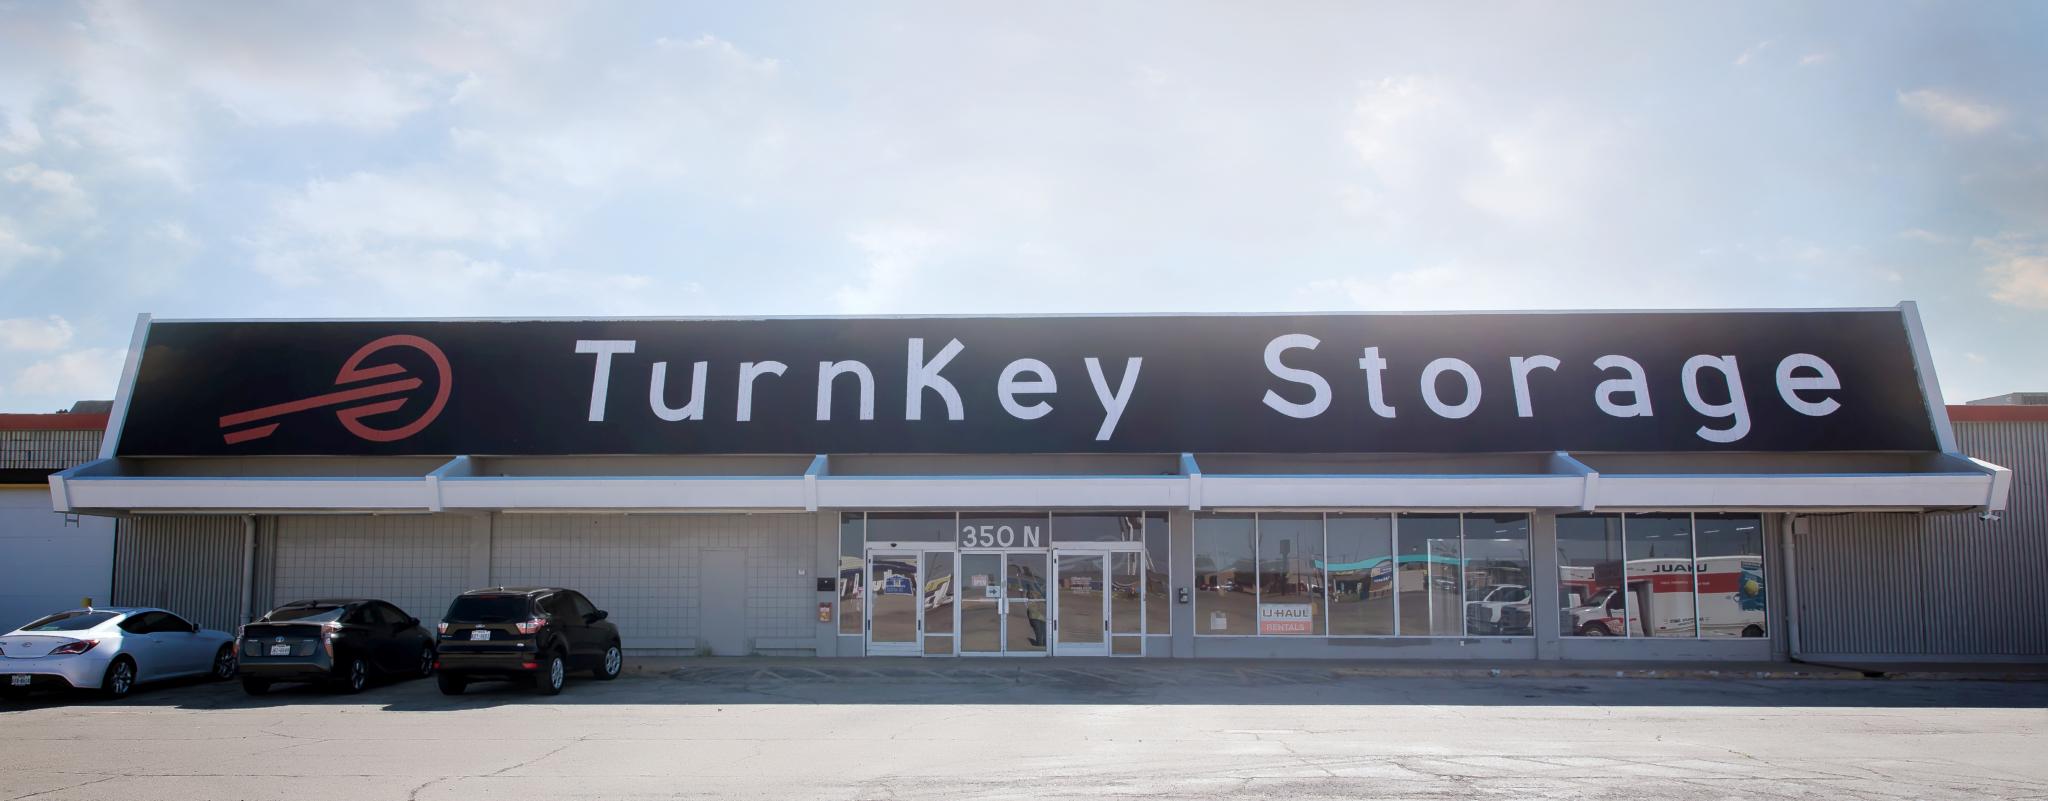 midland storage local self storage turnkey storage. Black Bedroom Furniture Sets. Home Design Ideas